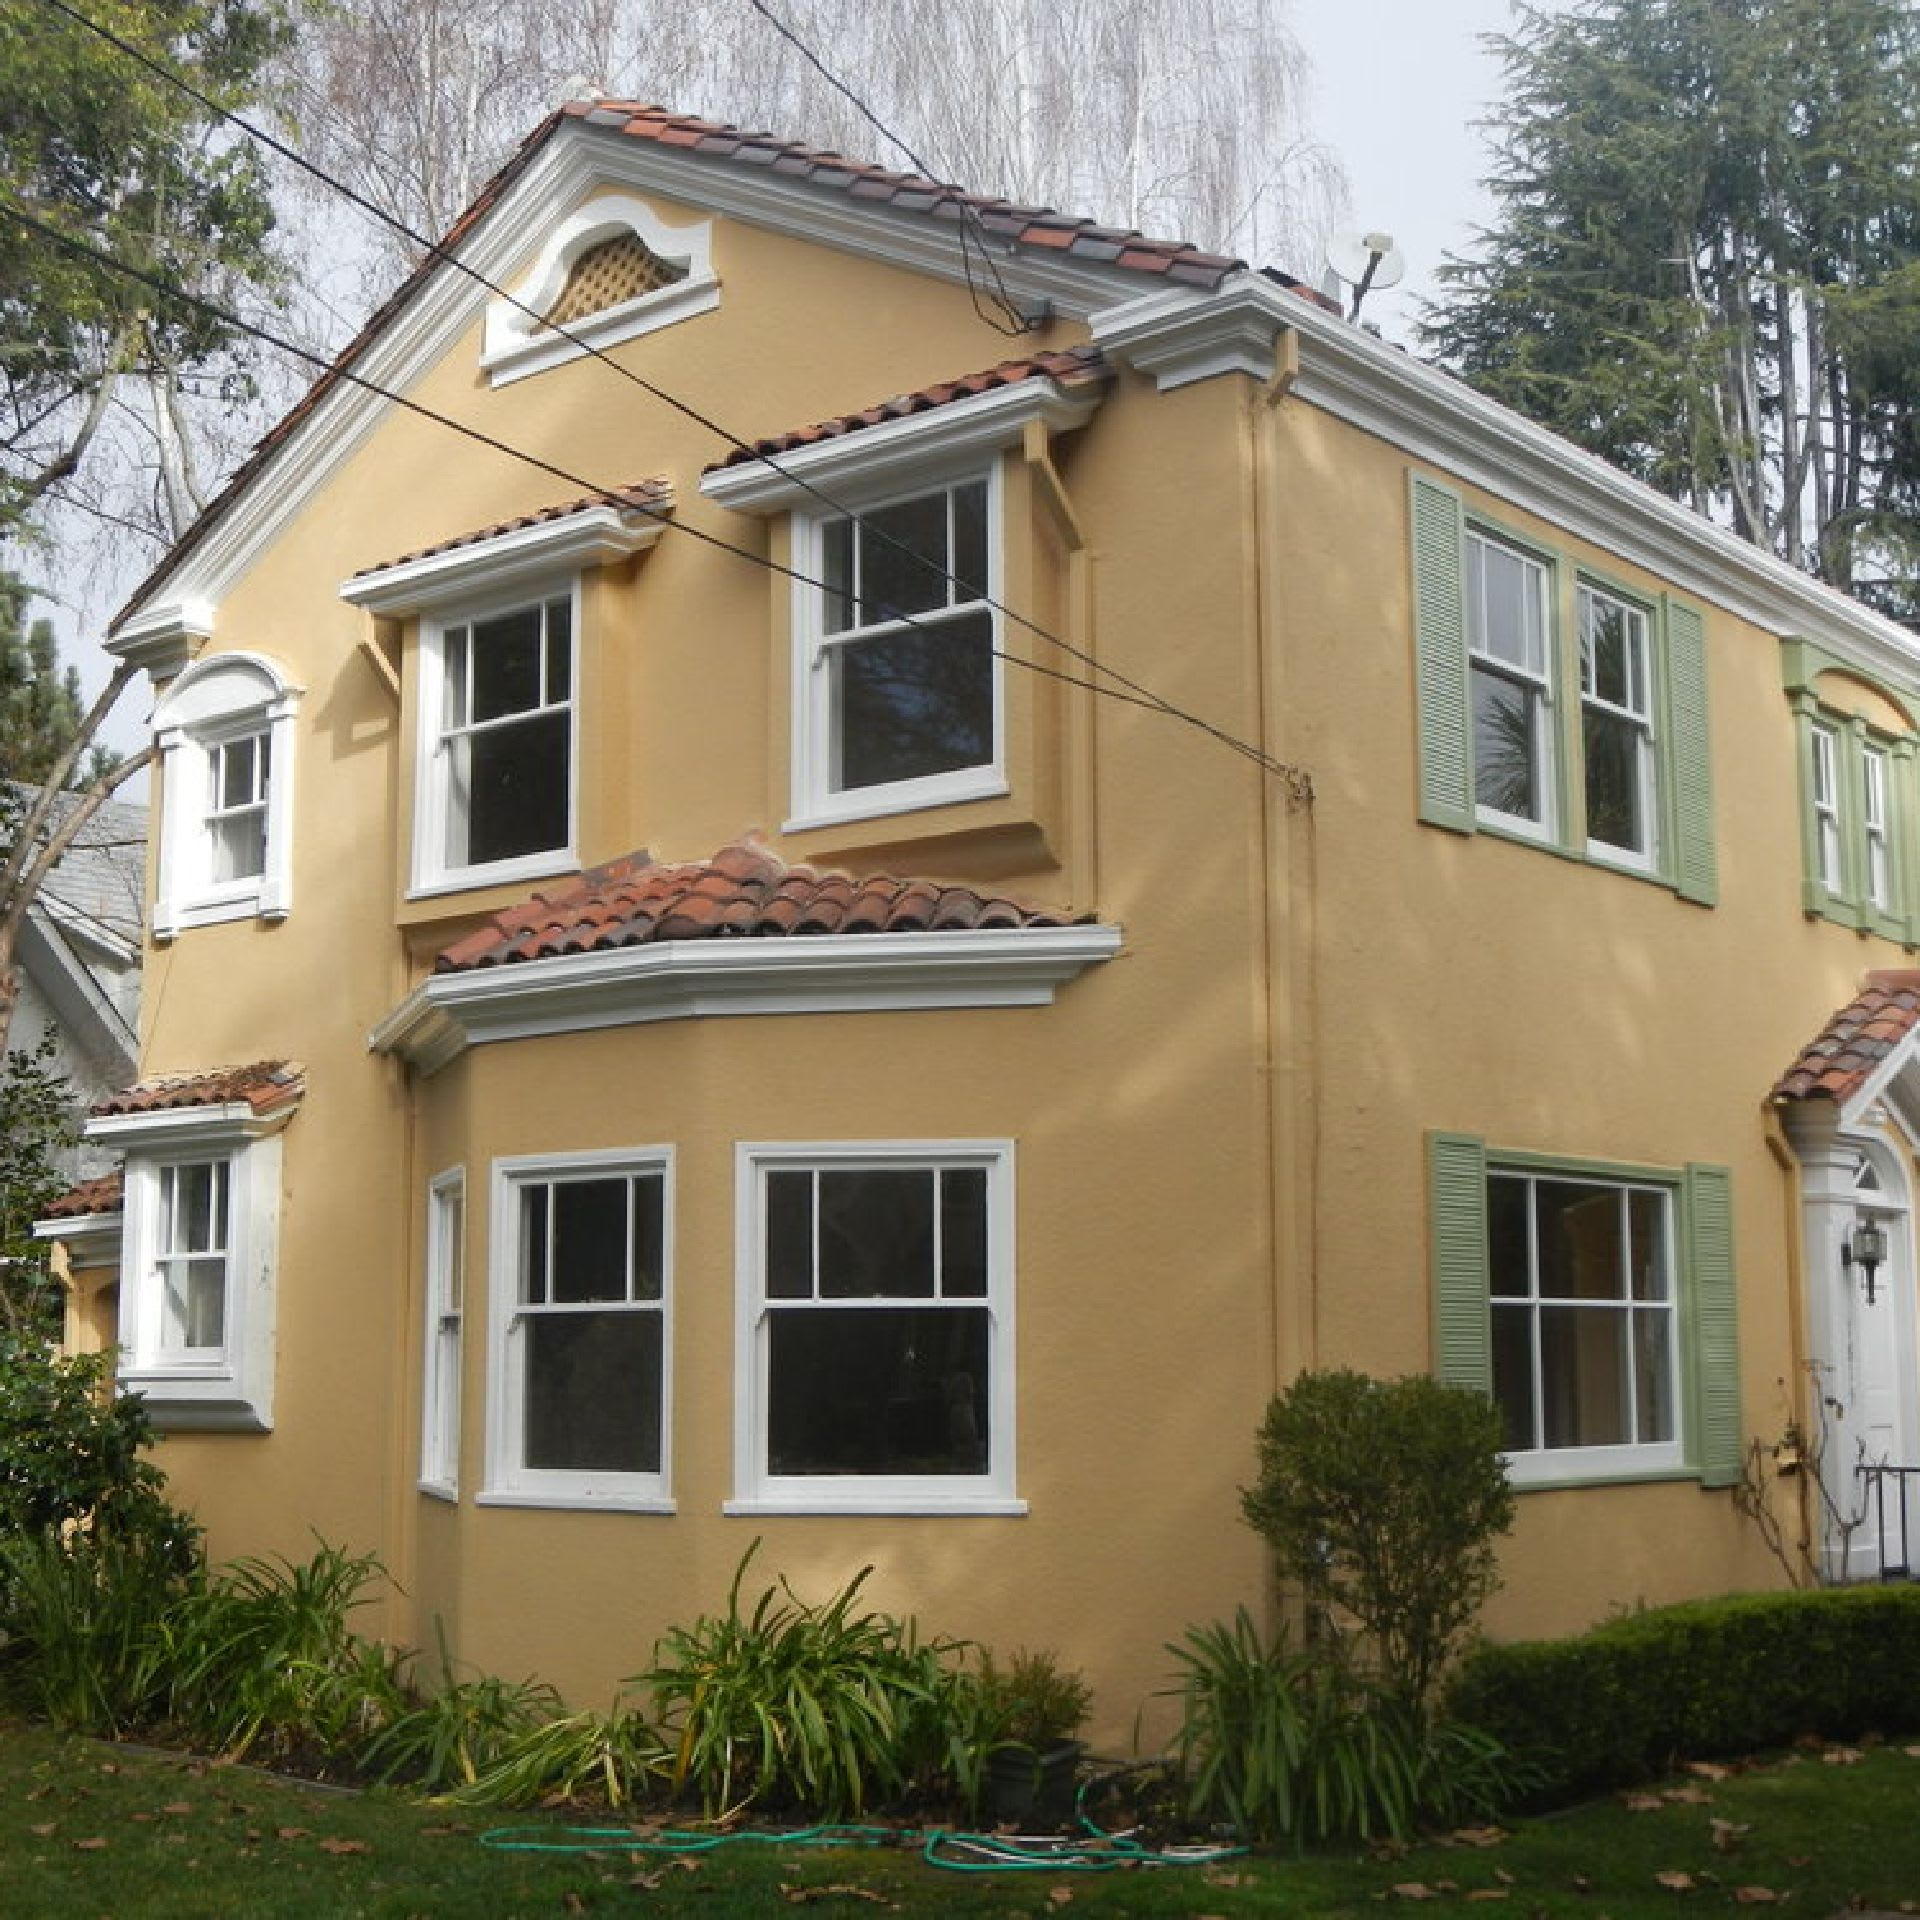 (2) 3BR/2BA houses in Palo Alt